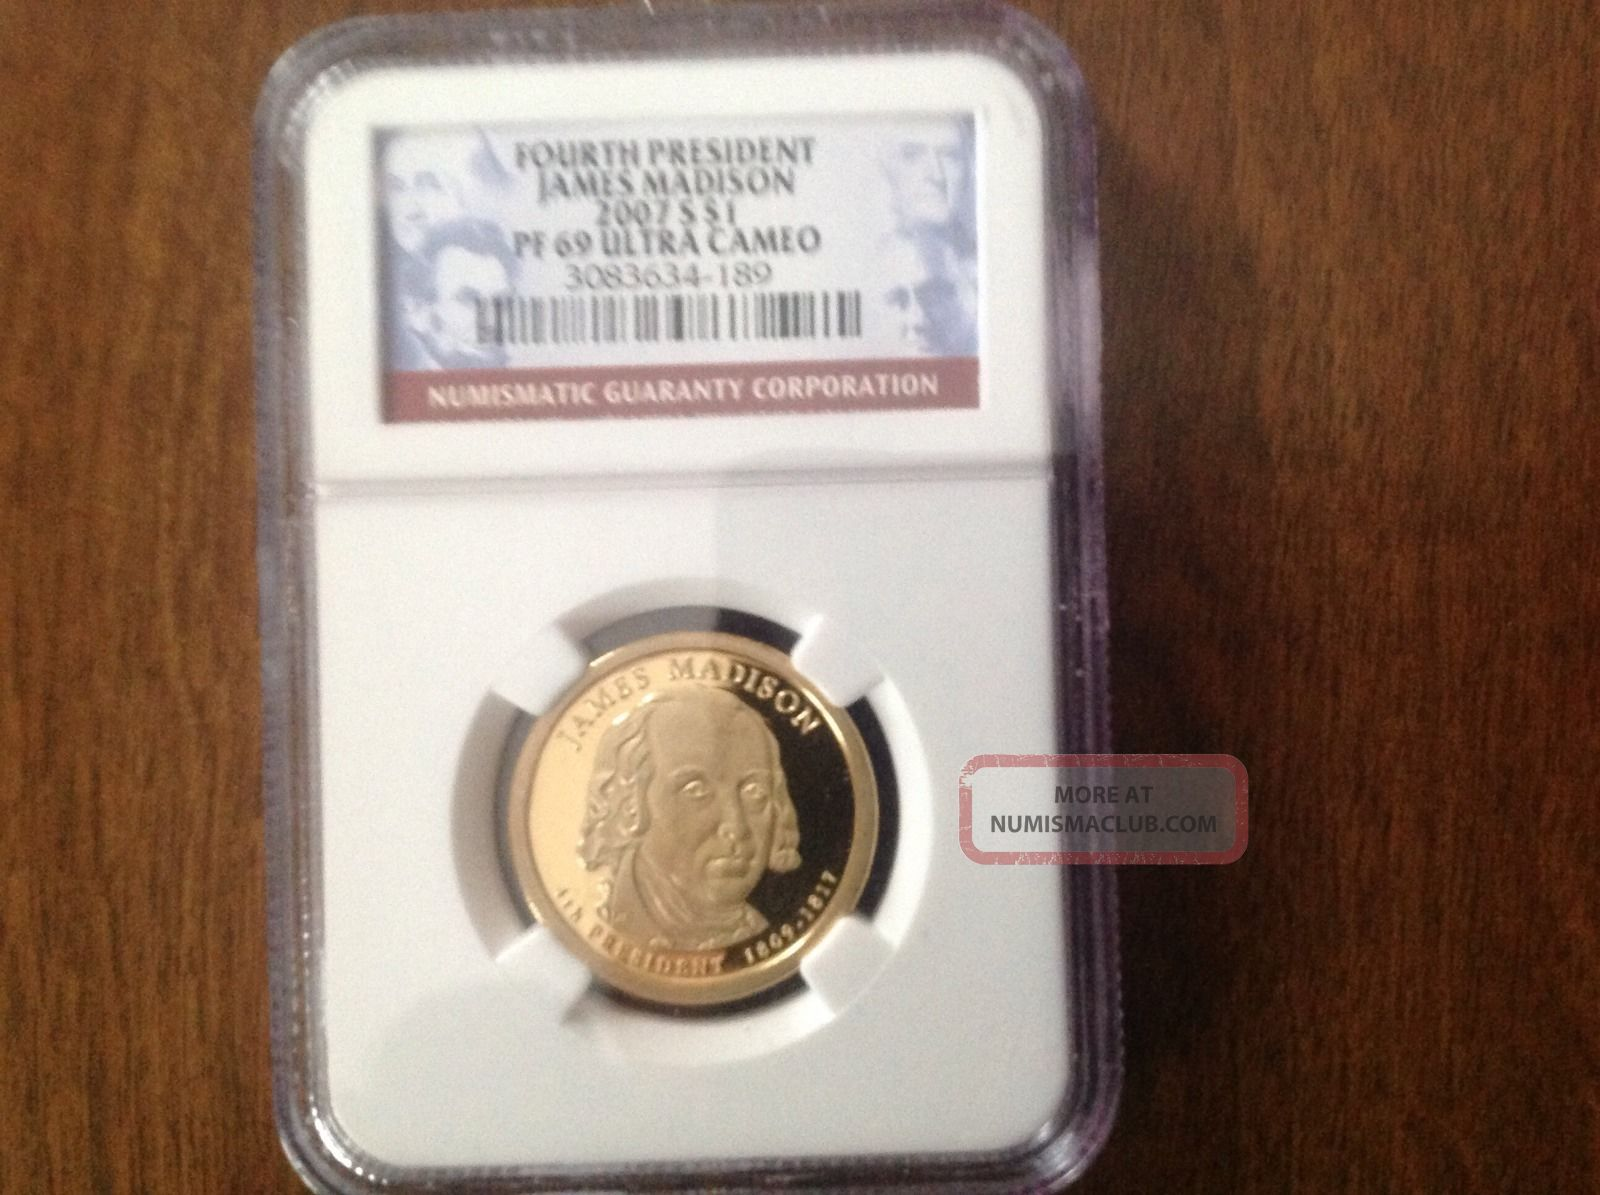 2007 S $1 James Madison Pf 69 Ultra Cameo Ngc Fourth President Dollars photo